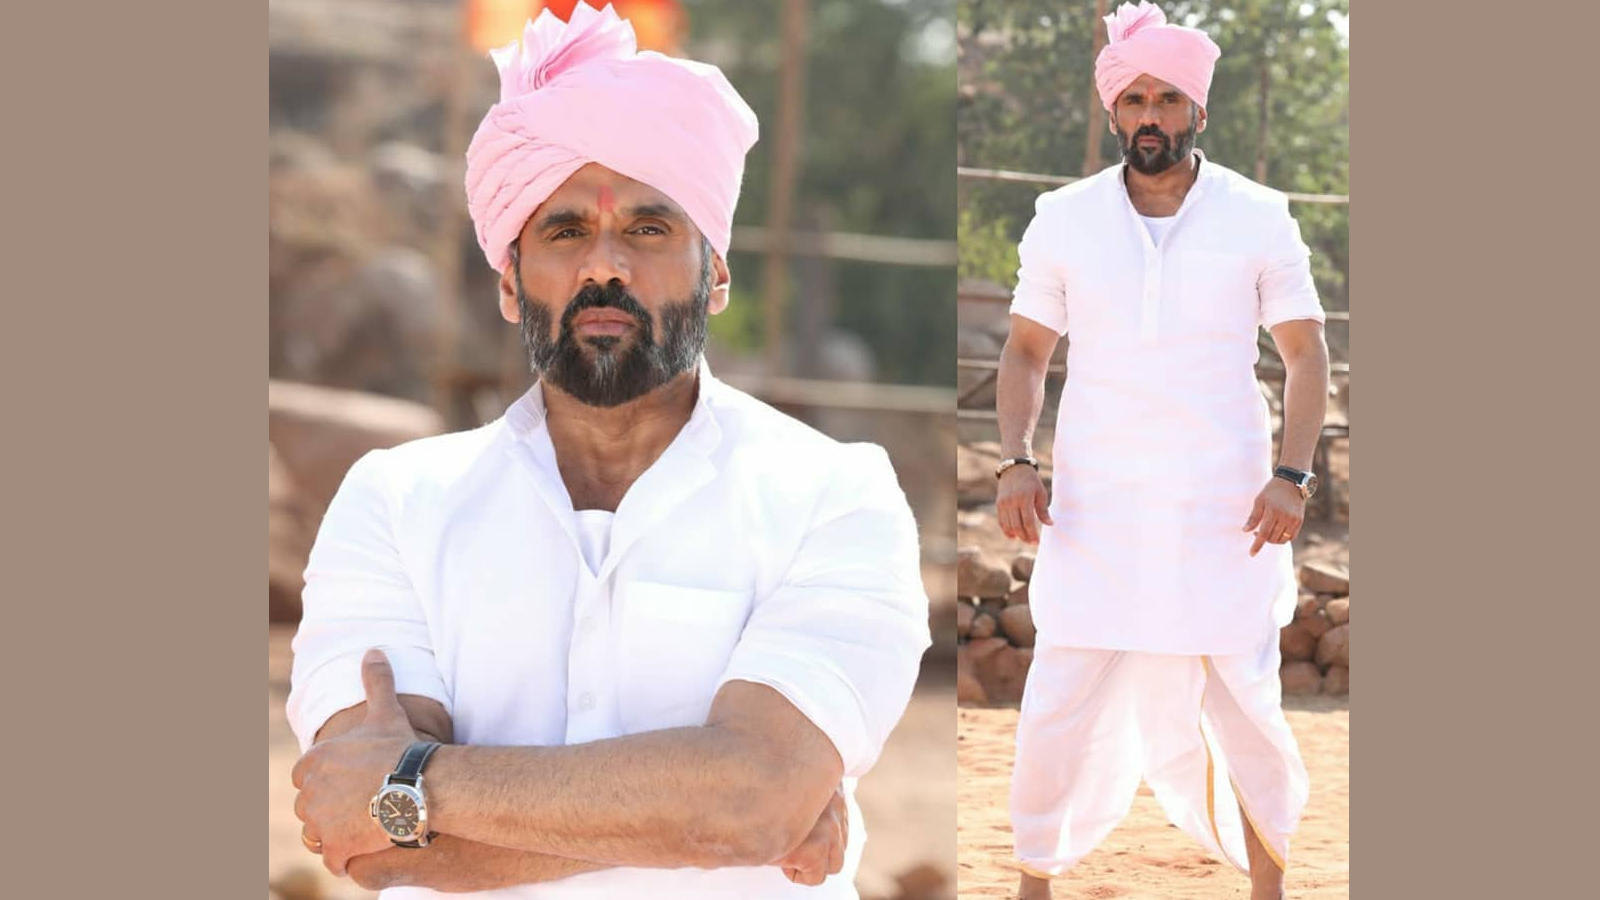 Suniel Shetty loves his 'Pehlwaan' look